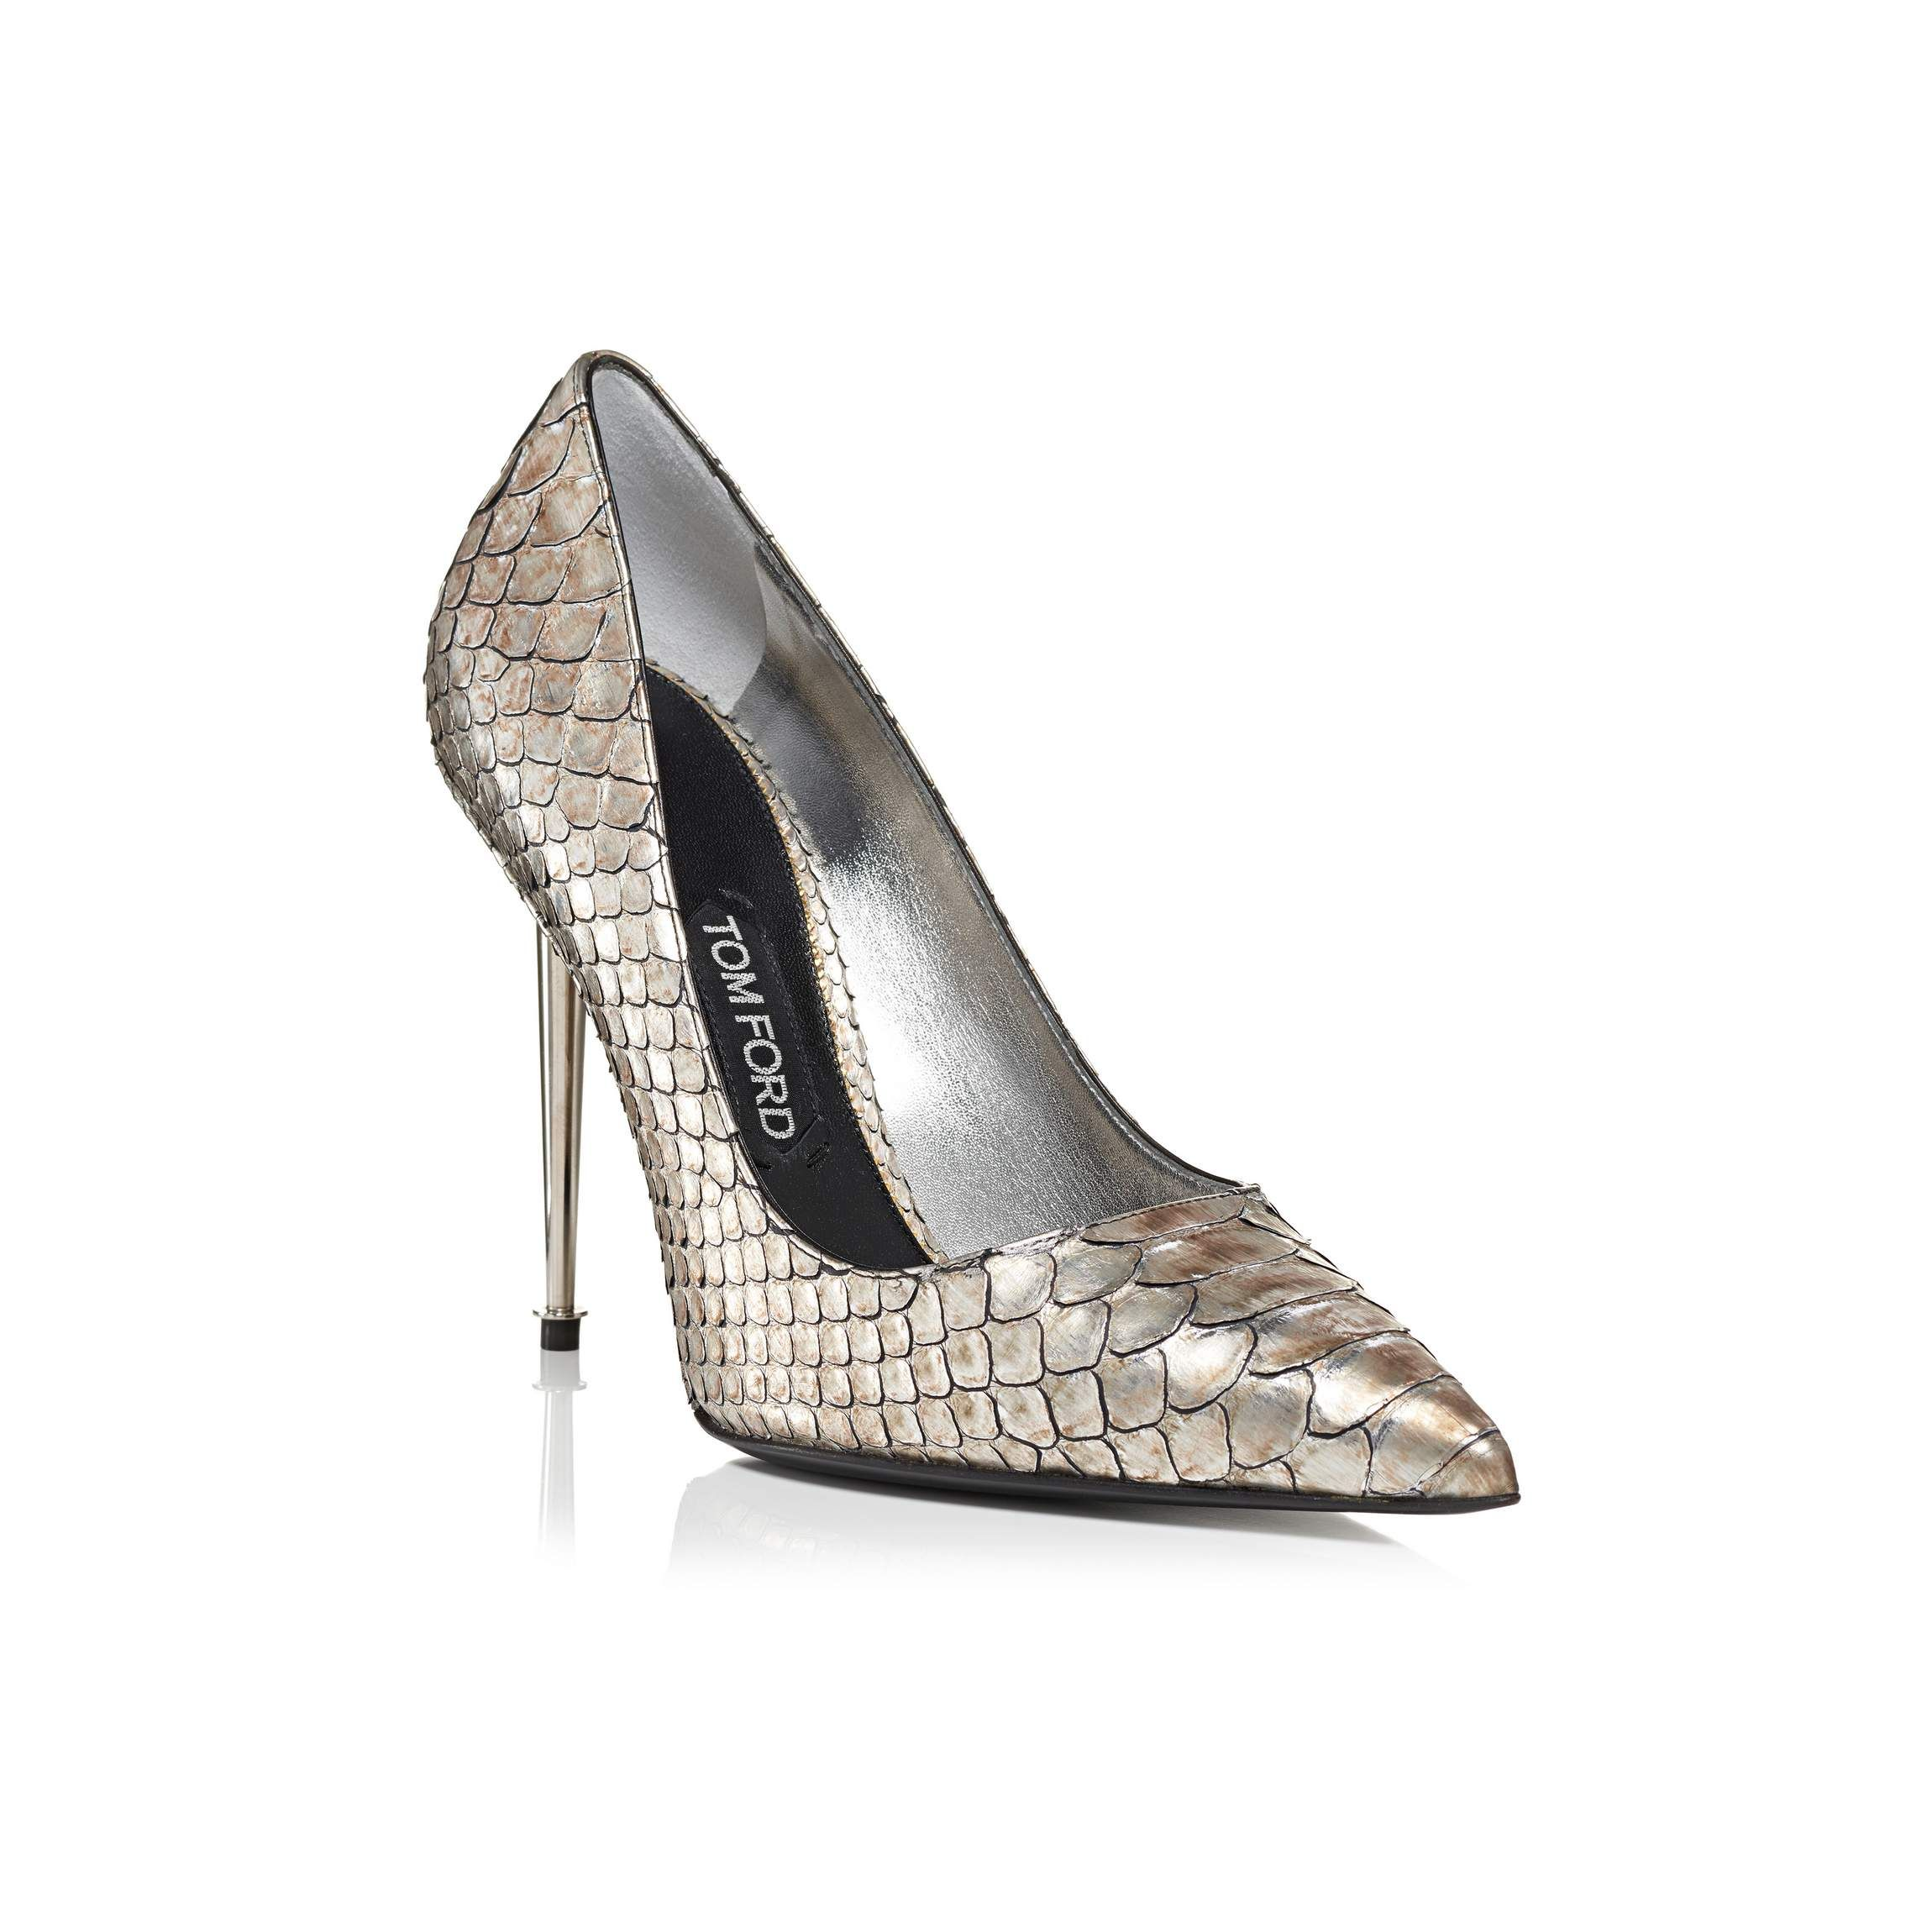 1a2eb71b48f0 Metallic Python Pump With Silver Spike Heel